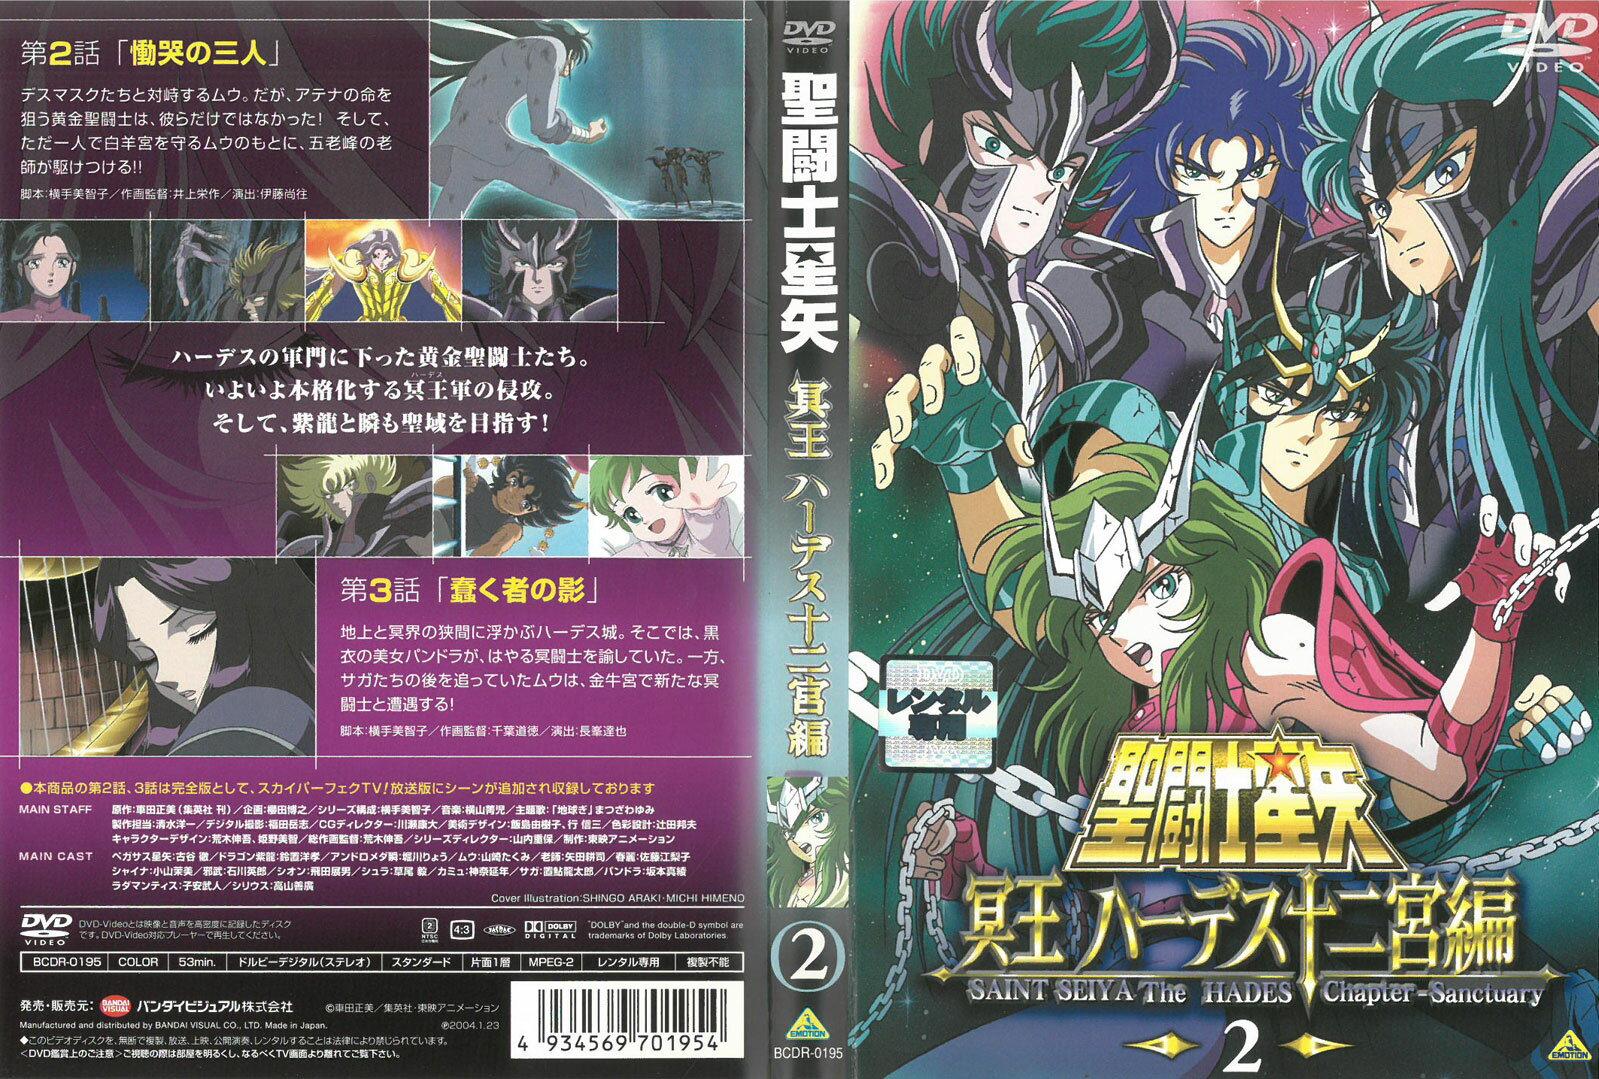 Knights Of The Zodiac dvd b00034 2 DVD